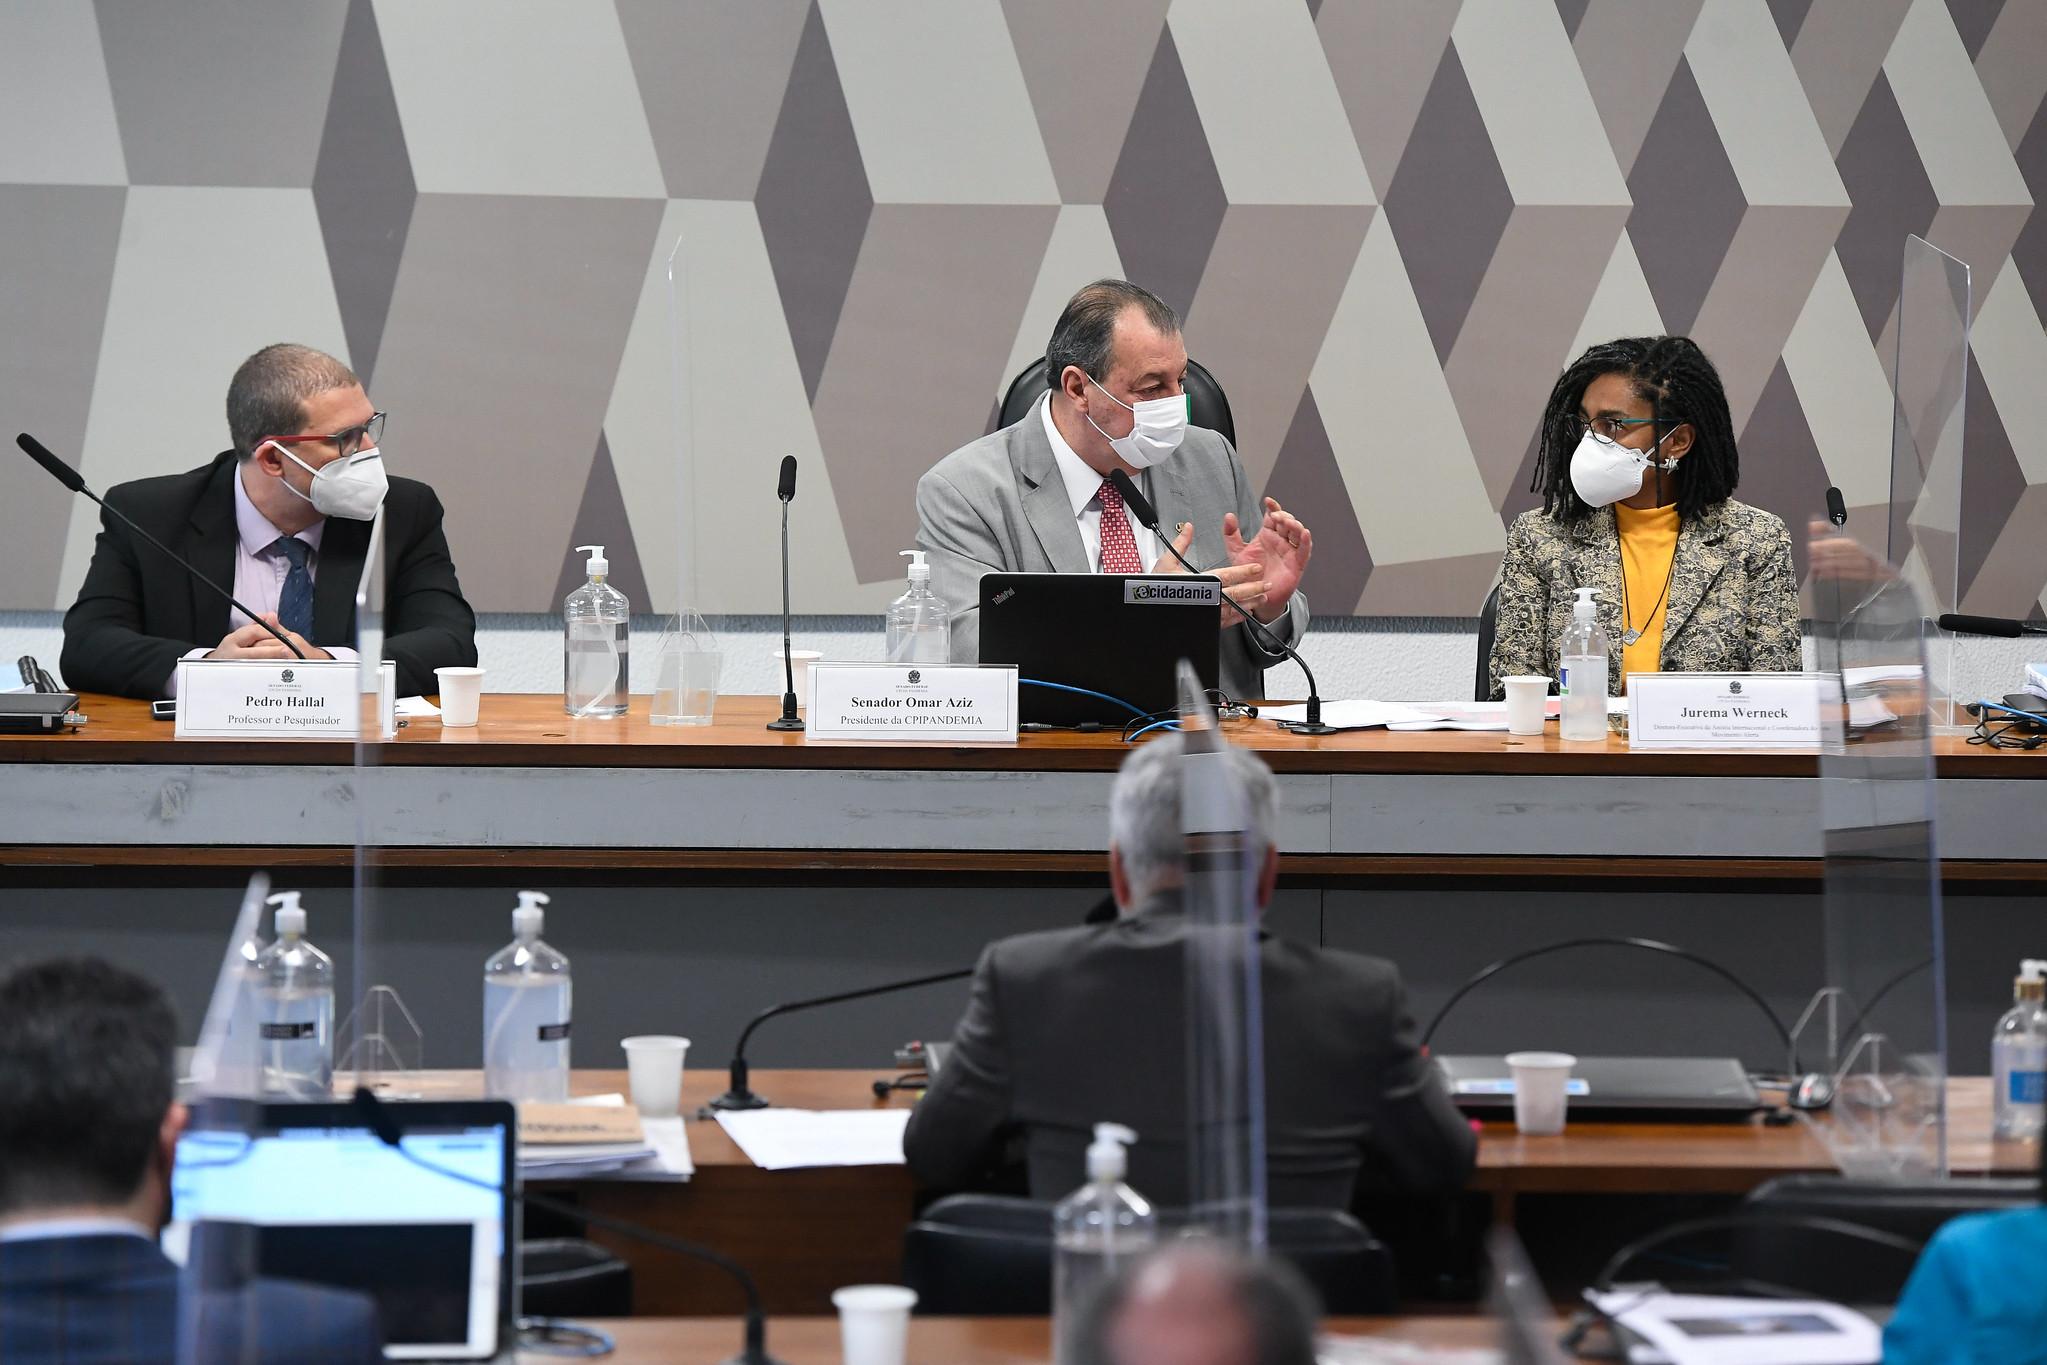 Pedro Hallal e Jurema Werneck prestam depoimento á CPI da Pandemia